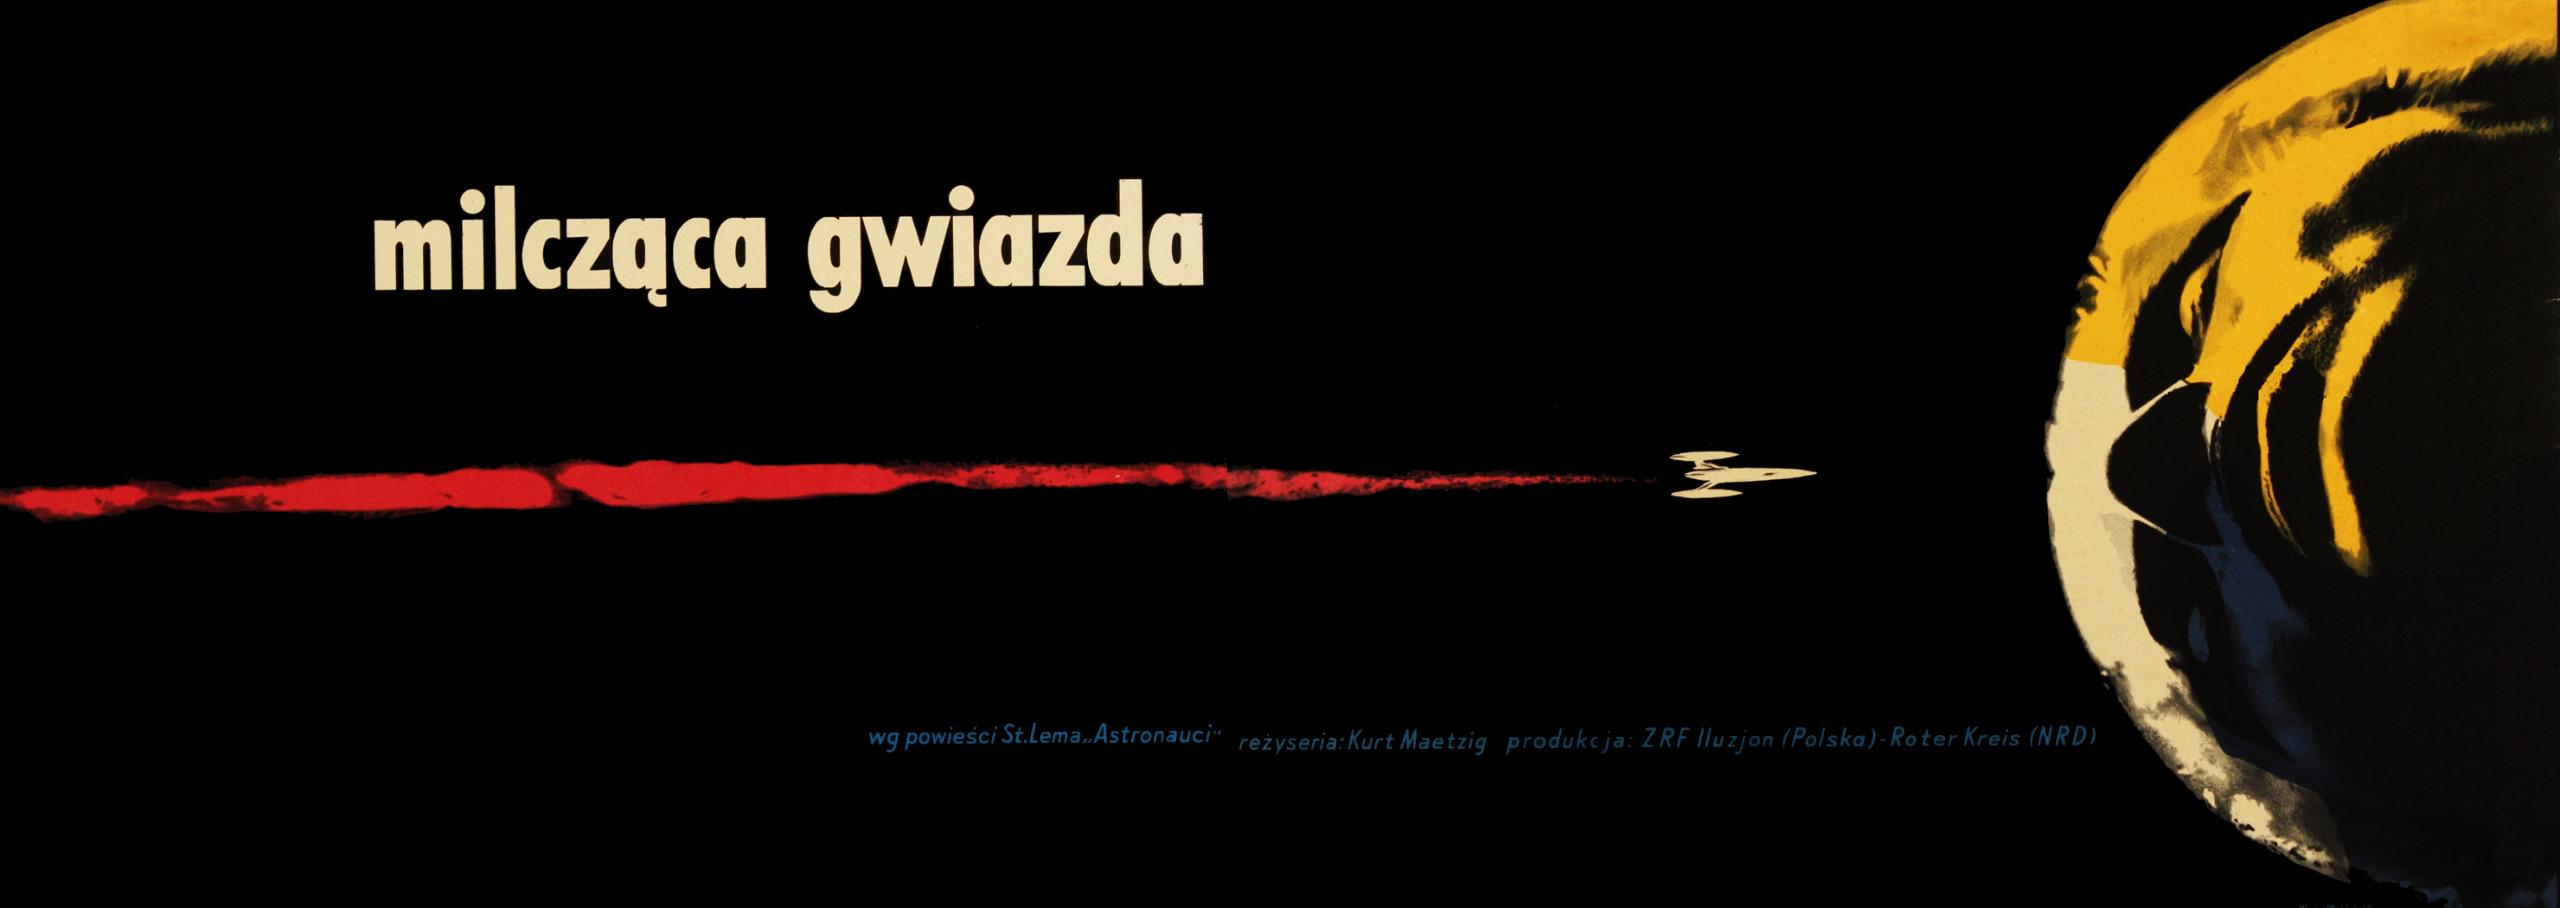 Aldo Chiozzi (@lesingerouge) Cover Image